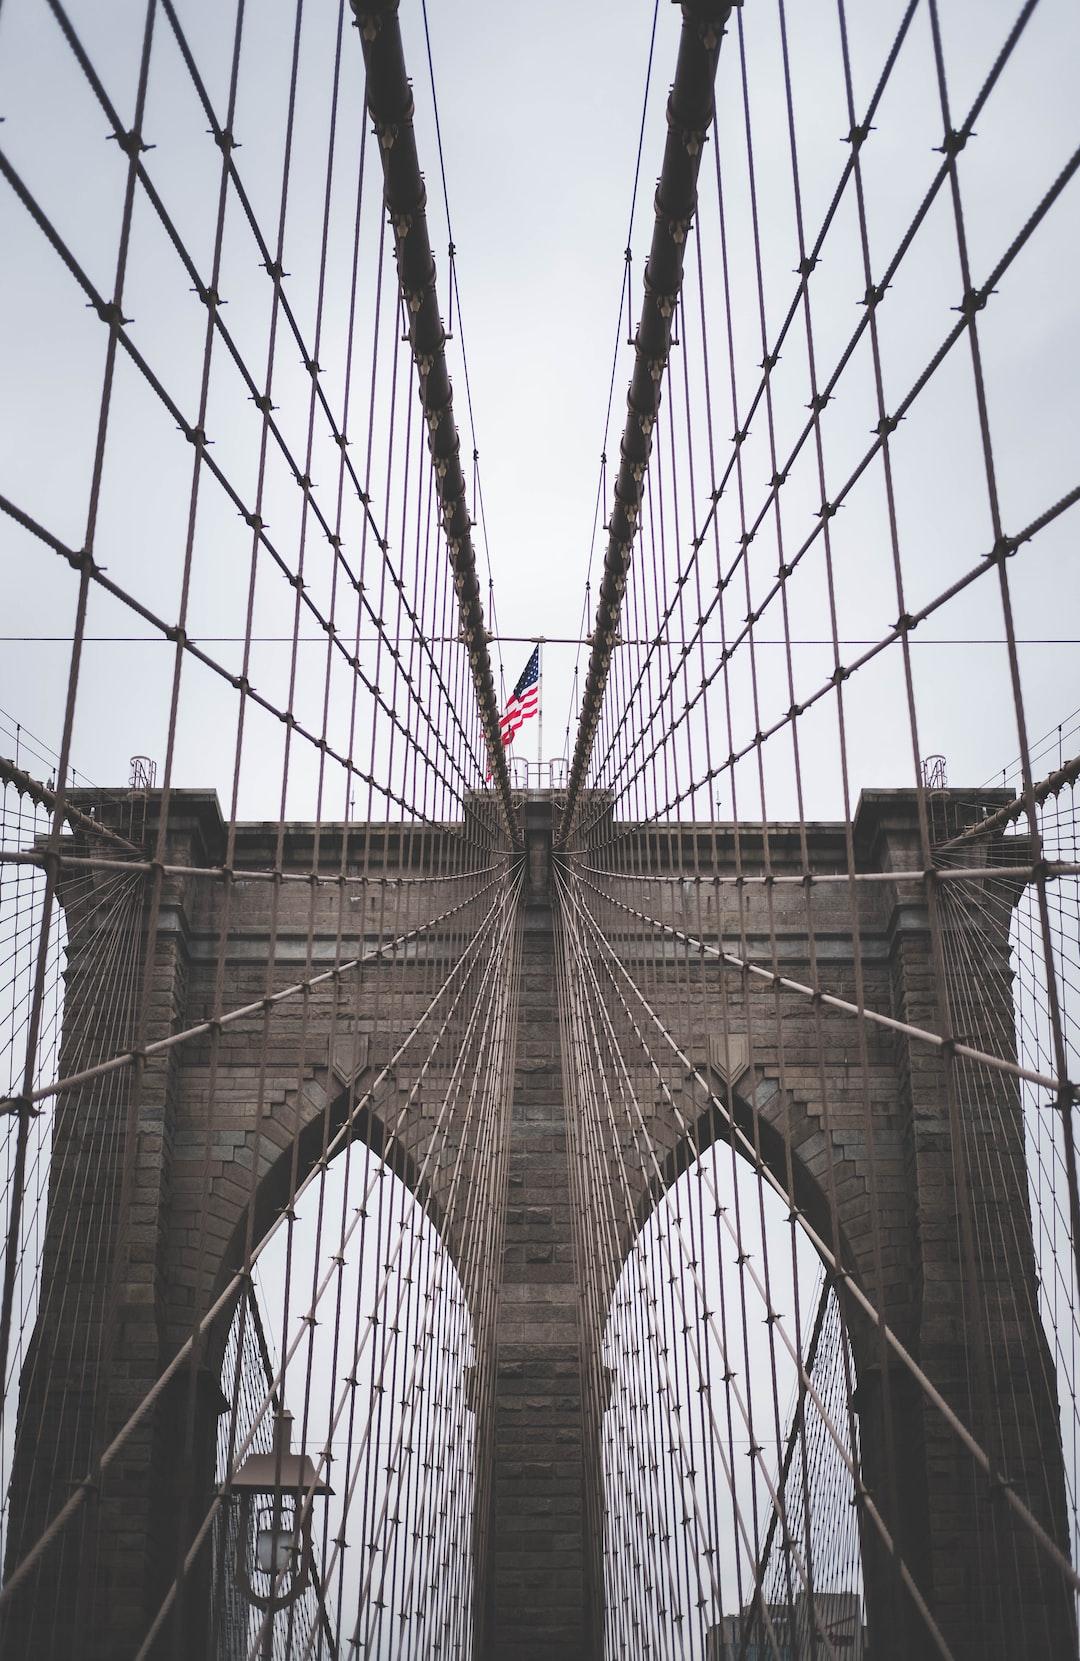 Symmetry on the Brooklyn bridge